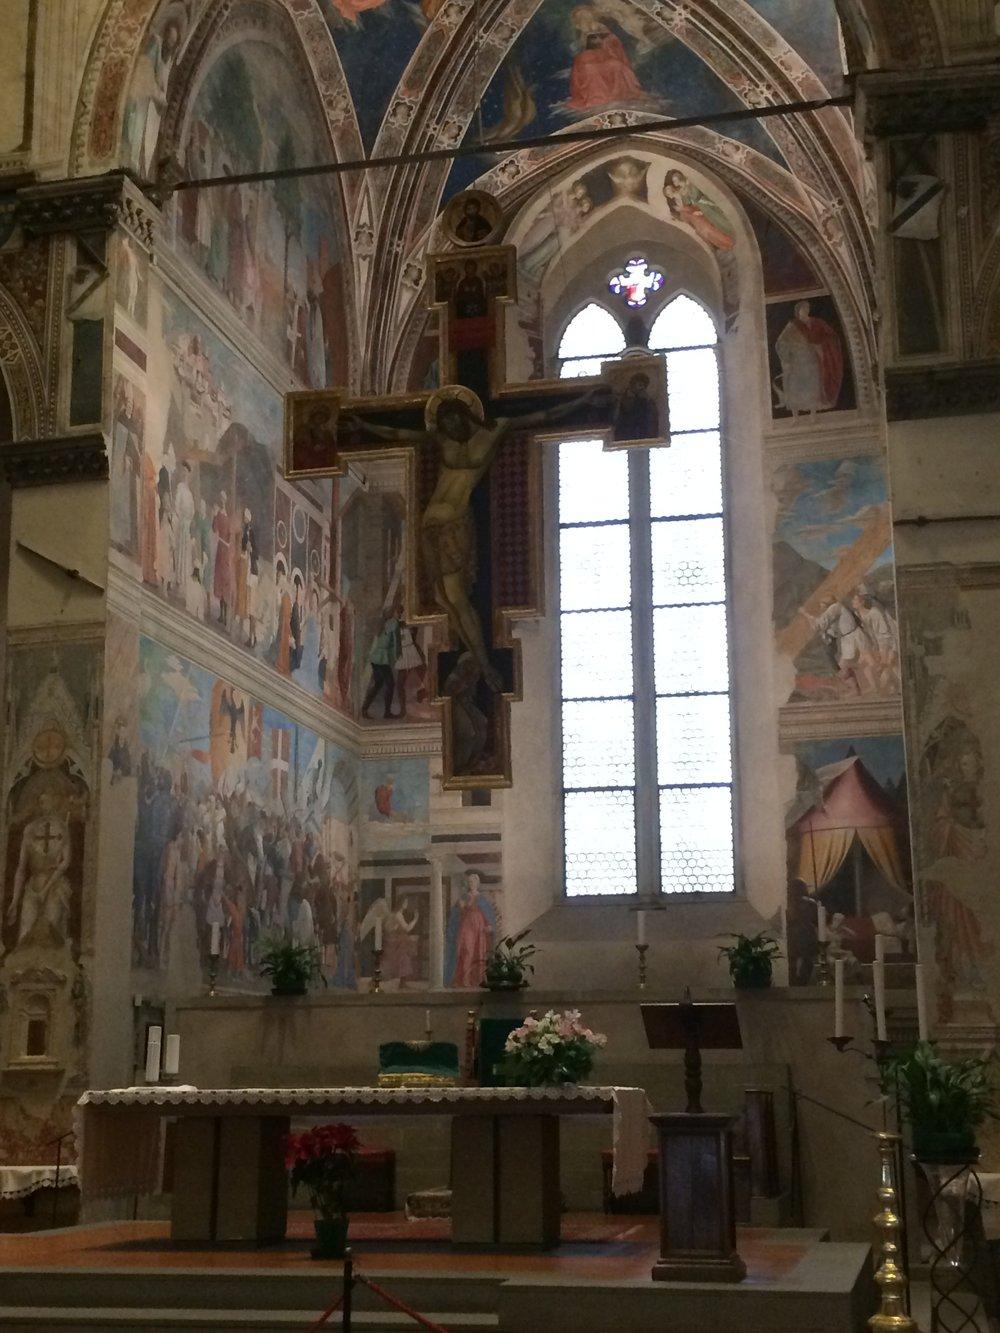 Piero della Francesca, Legend of the Holy Cross, San Francesco, Arezzo [author photograph]